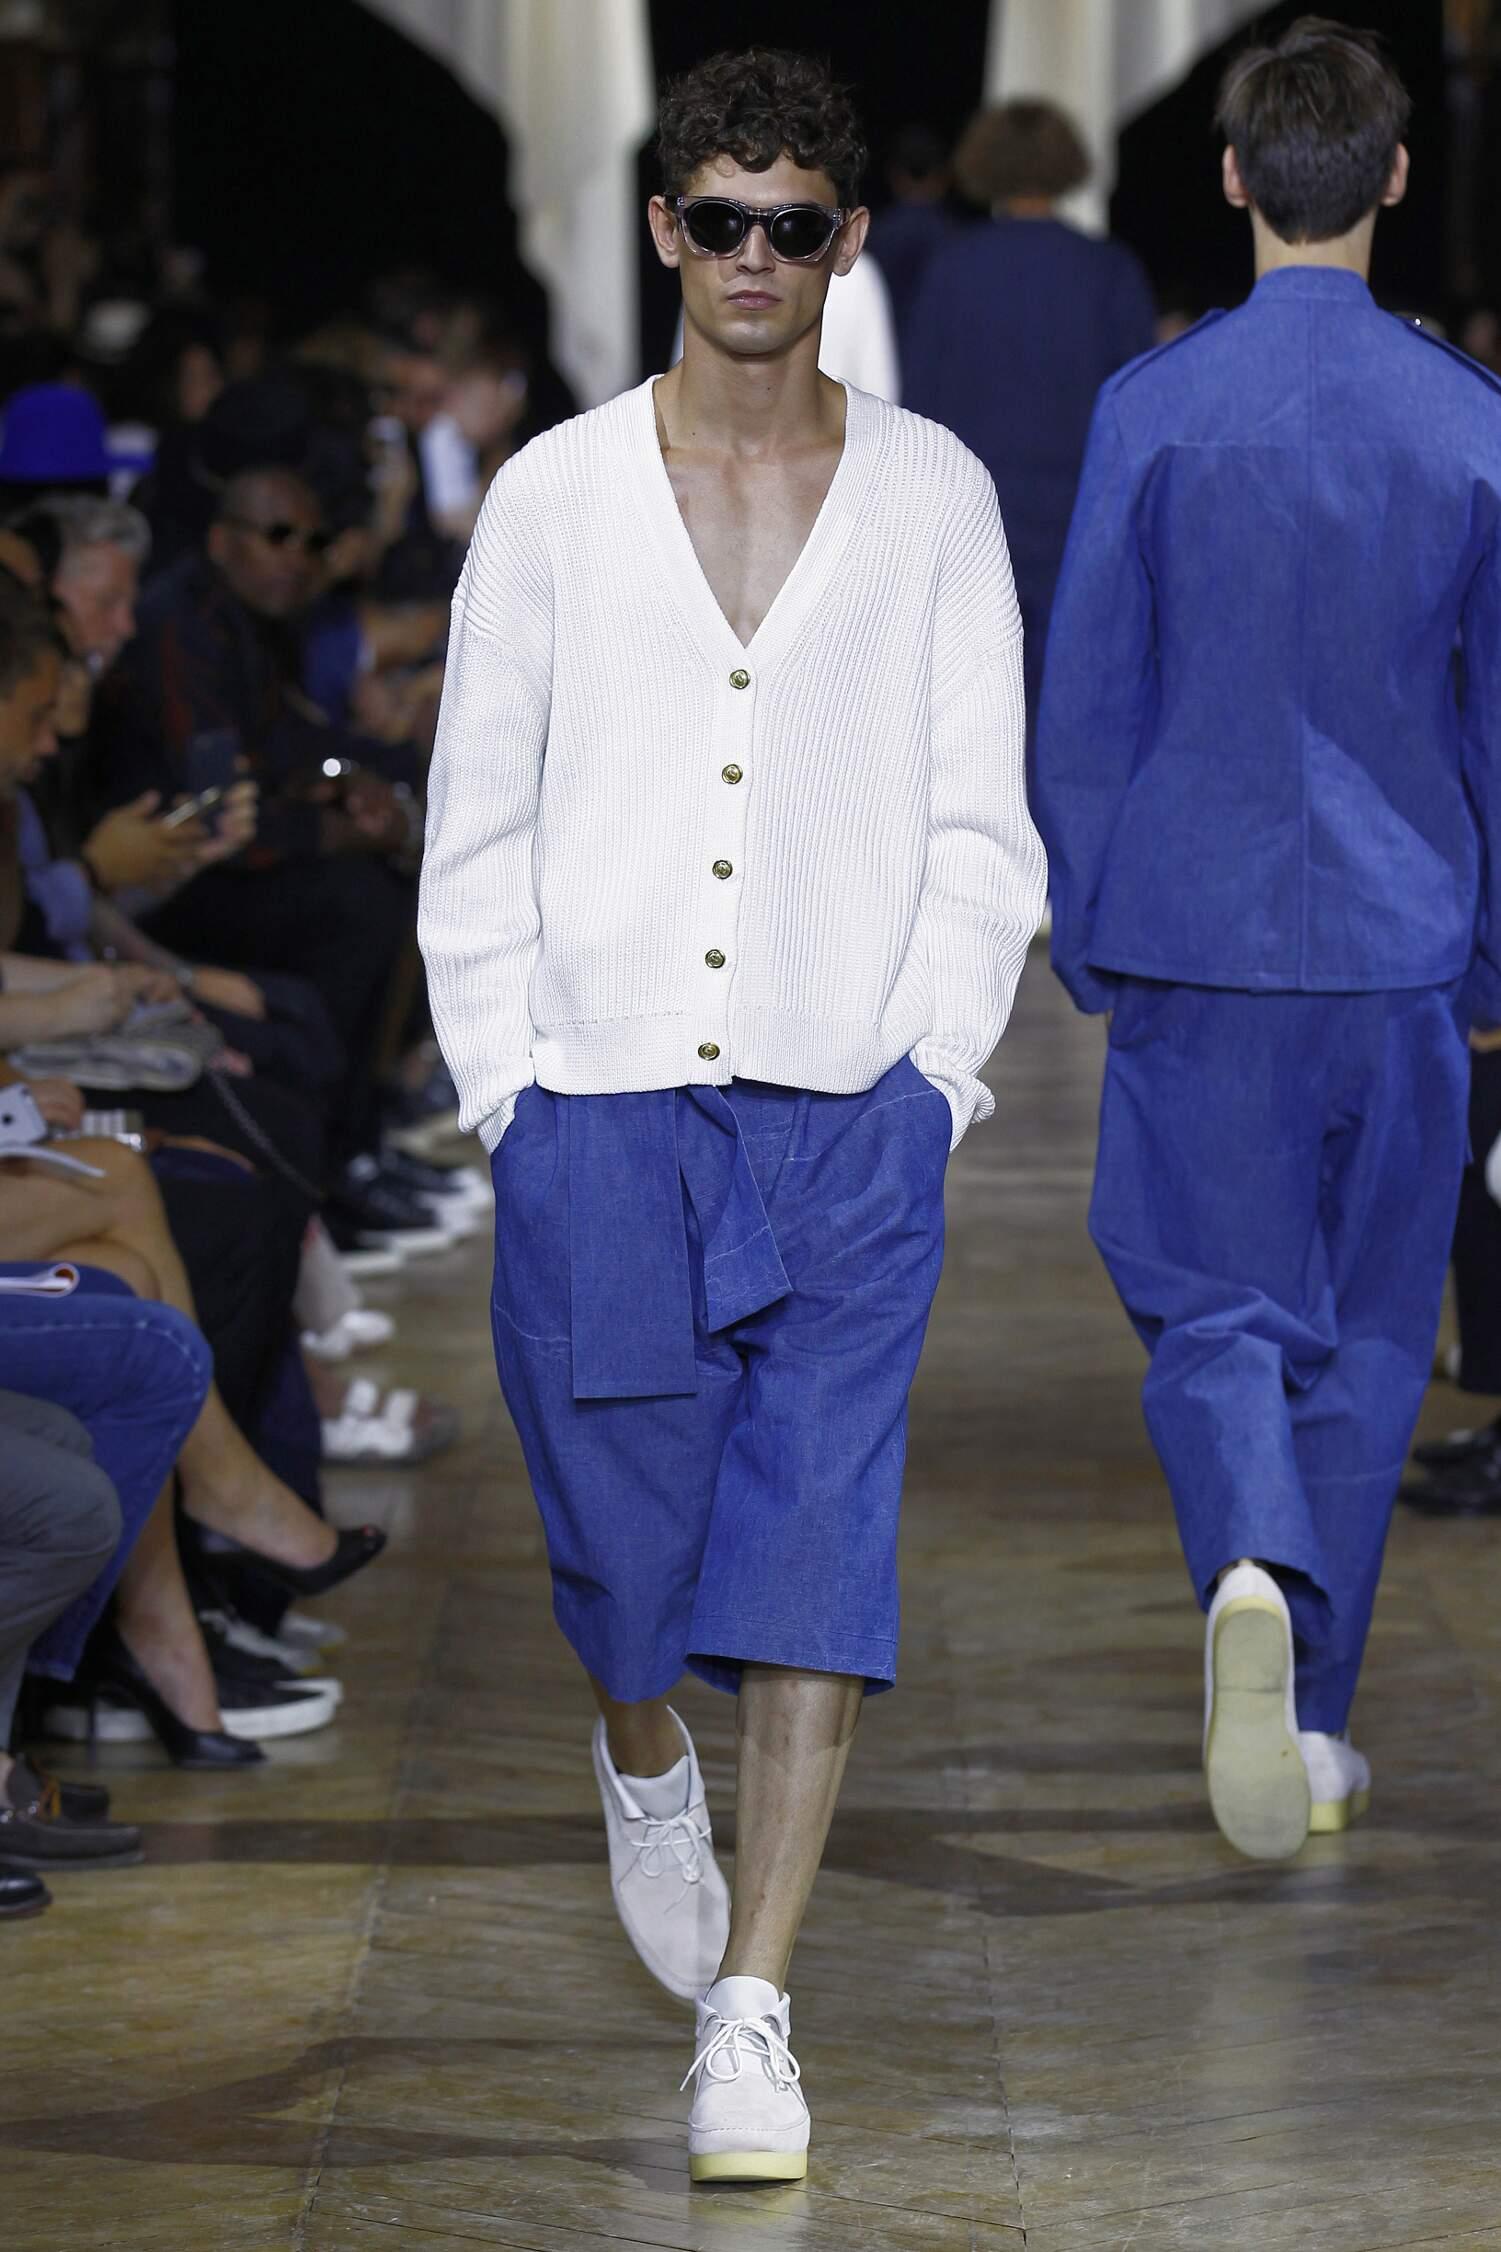 Runway Phillip Lim Spring Summer 2016 Men's Collection Paris Fashion Week